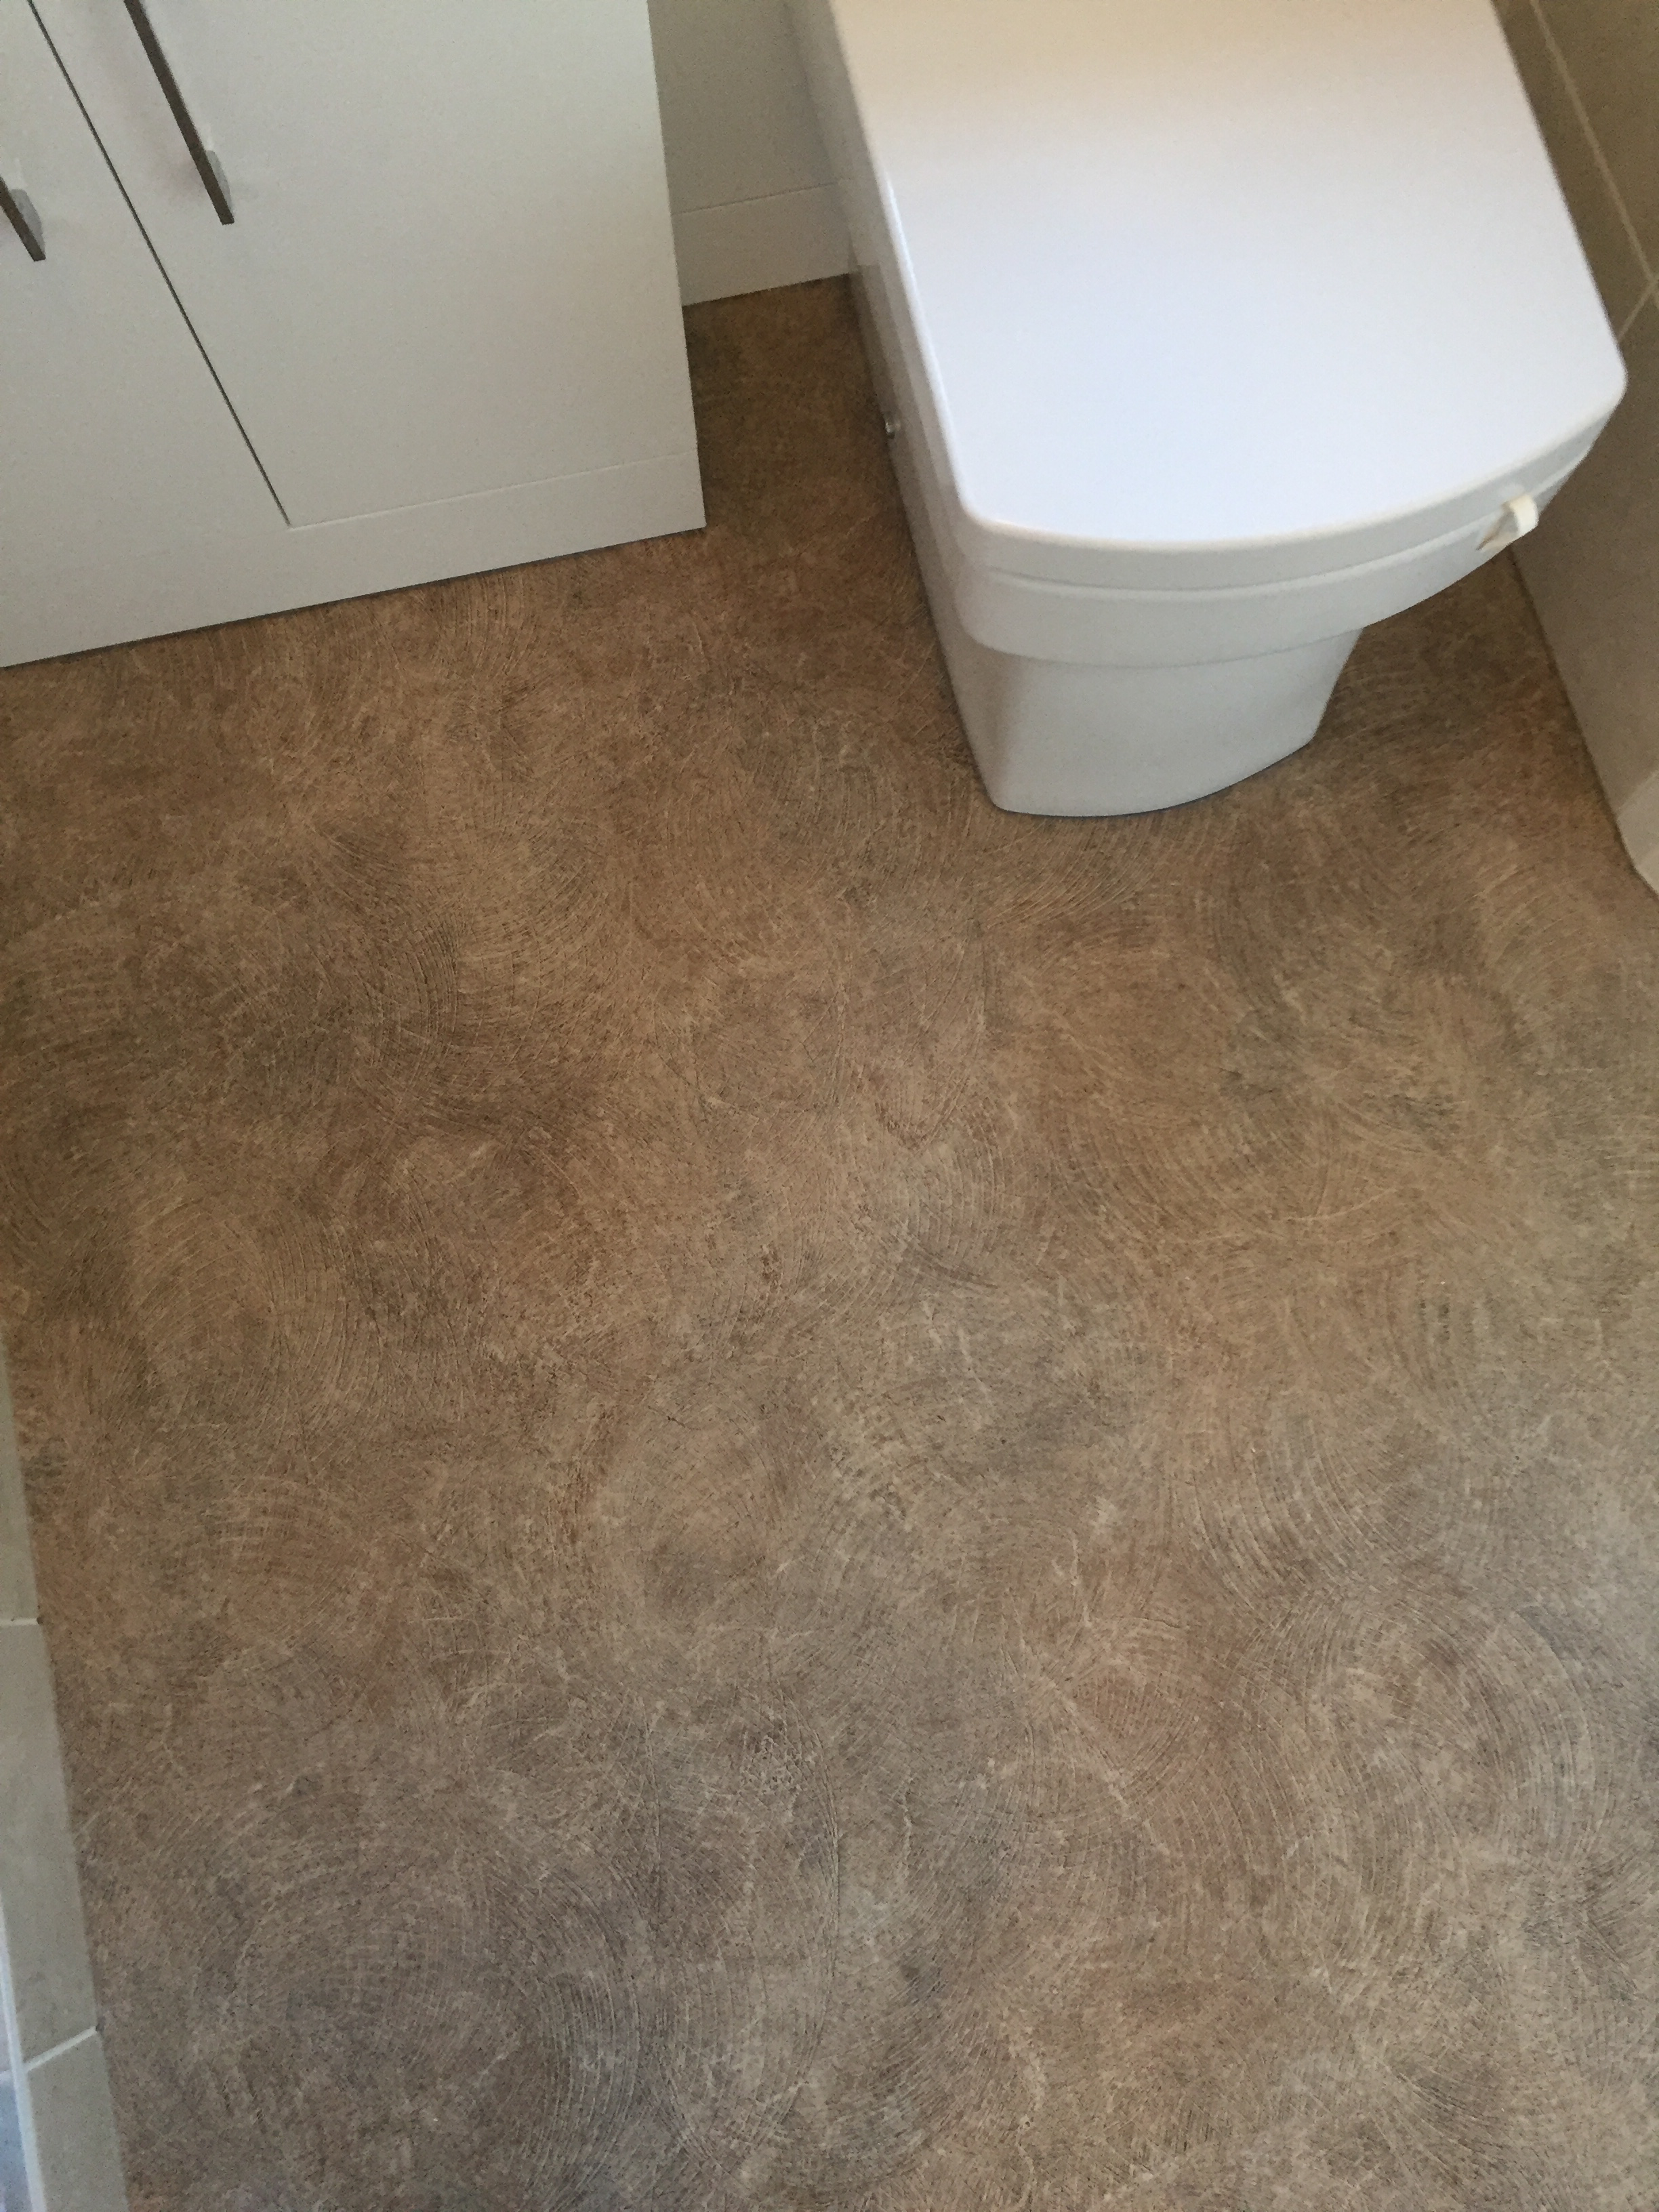 Vinyl flooring bathroom burgess hill, west sussex